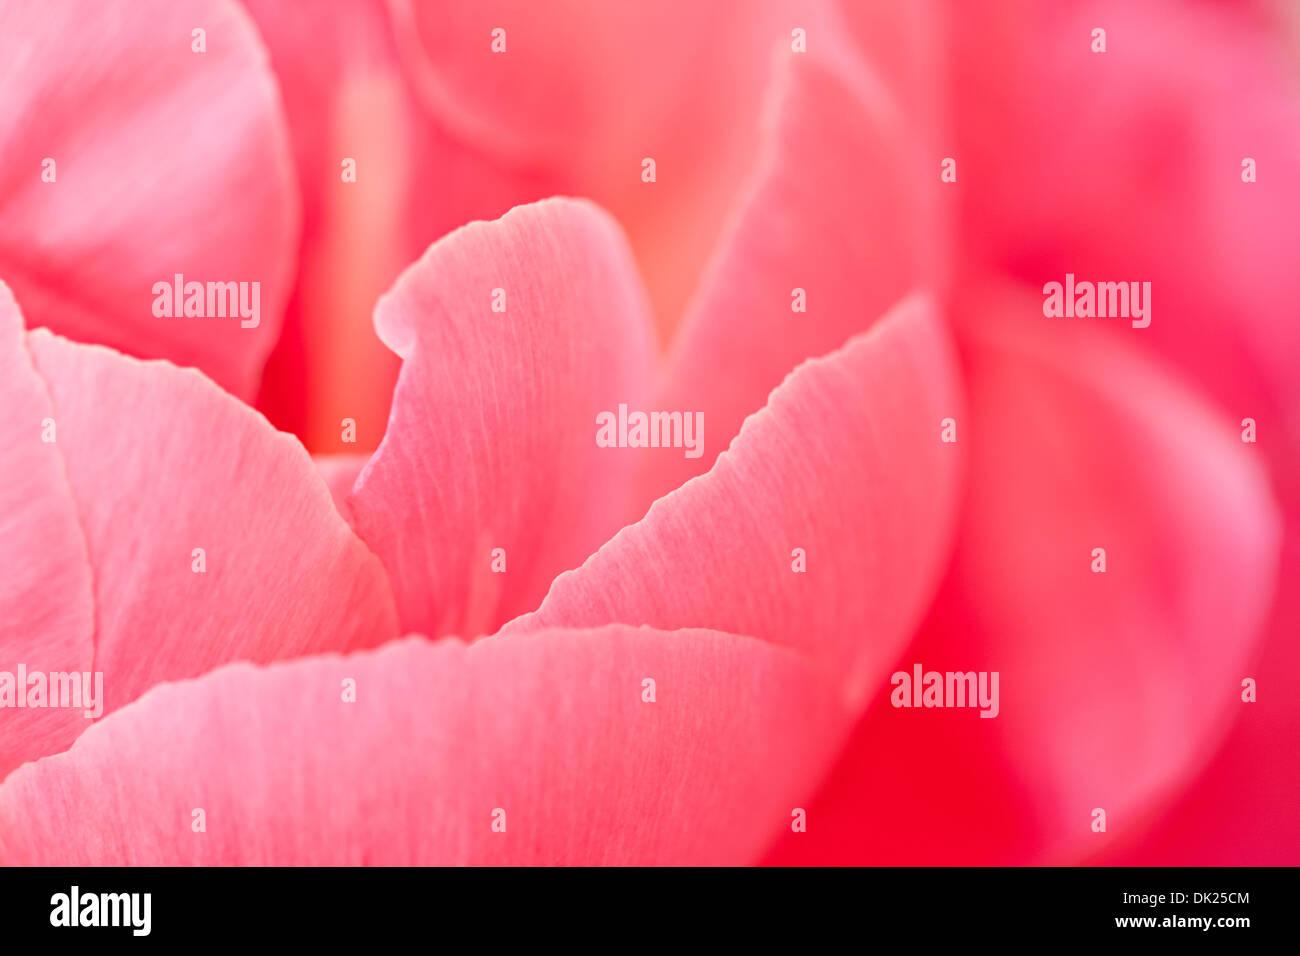 Full frame close up detail of pink peony petals - Stock Image